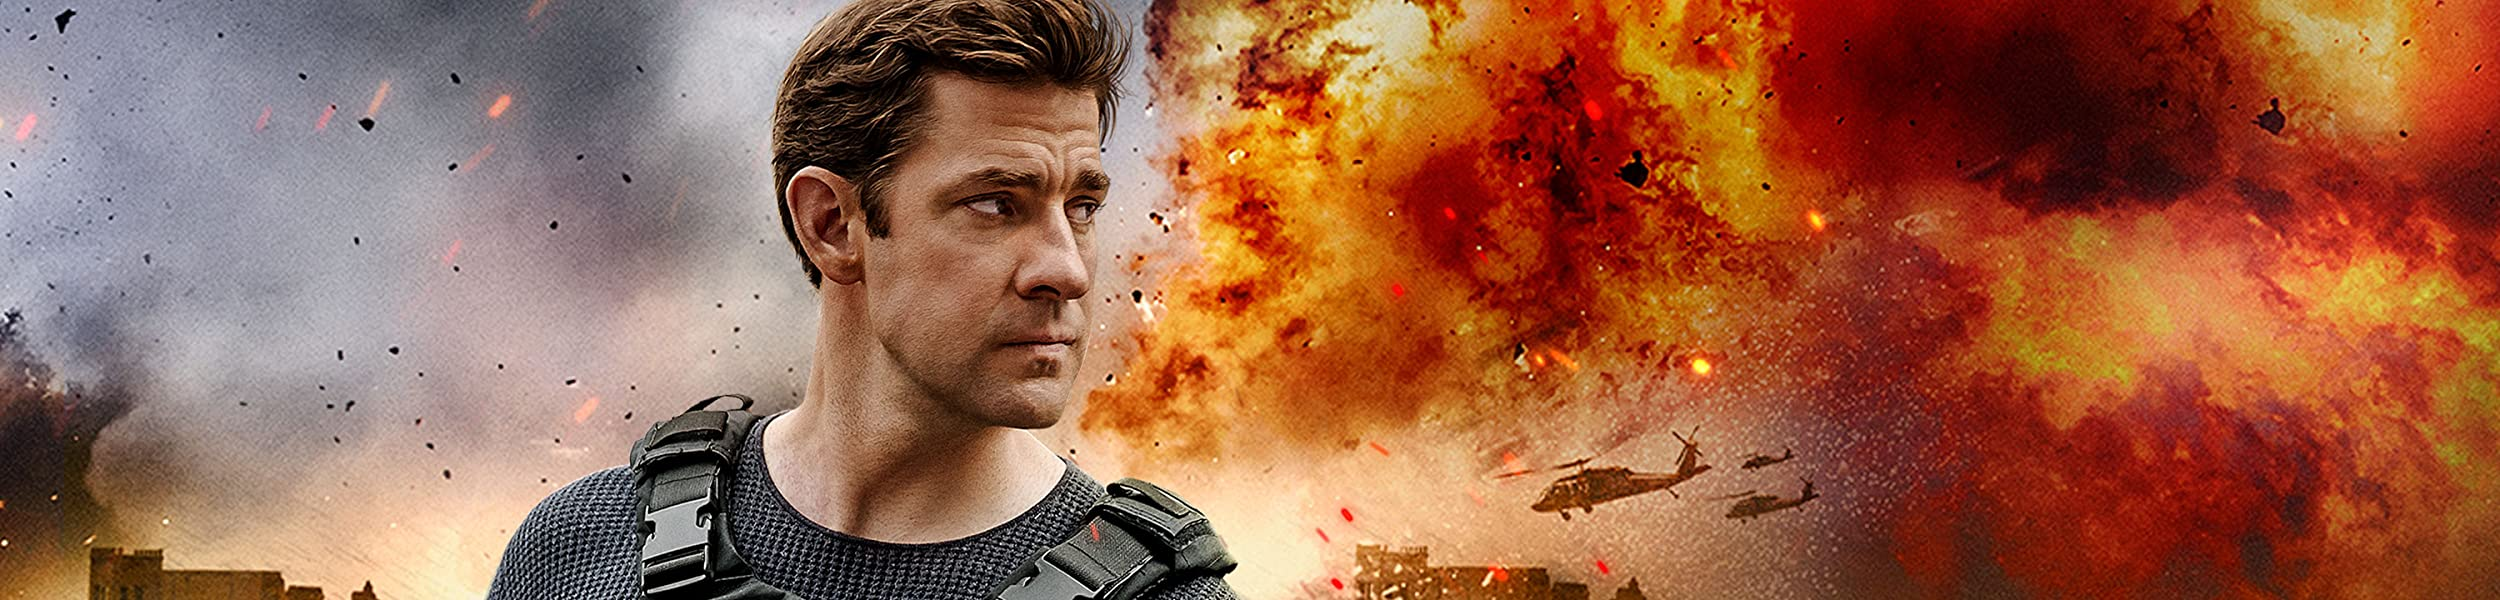 Tom Clancy's Jack Ryan. Coming August 31. Watch on Prime Video.